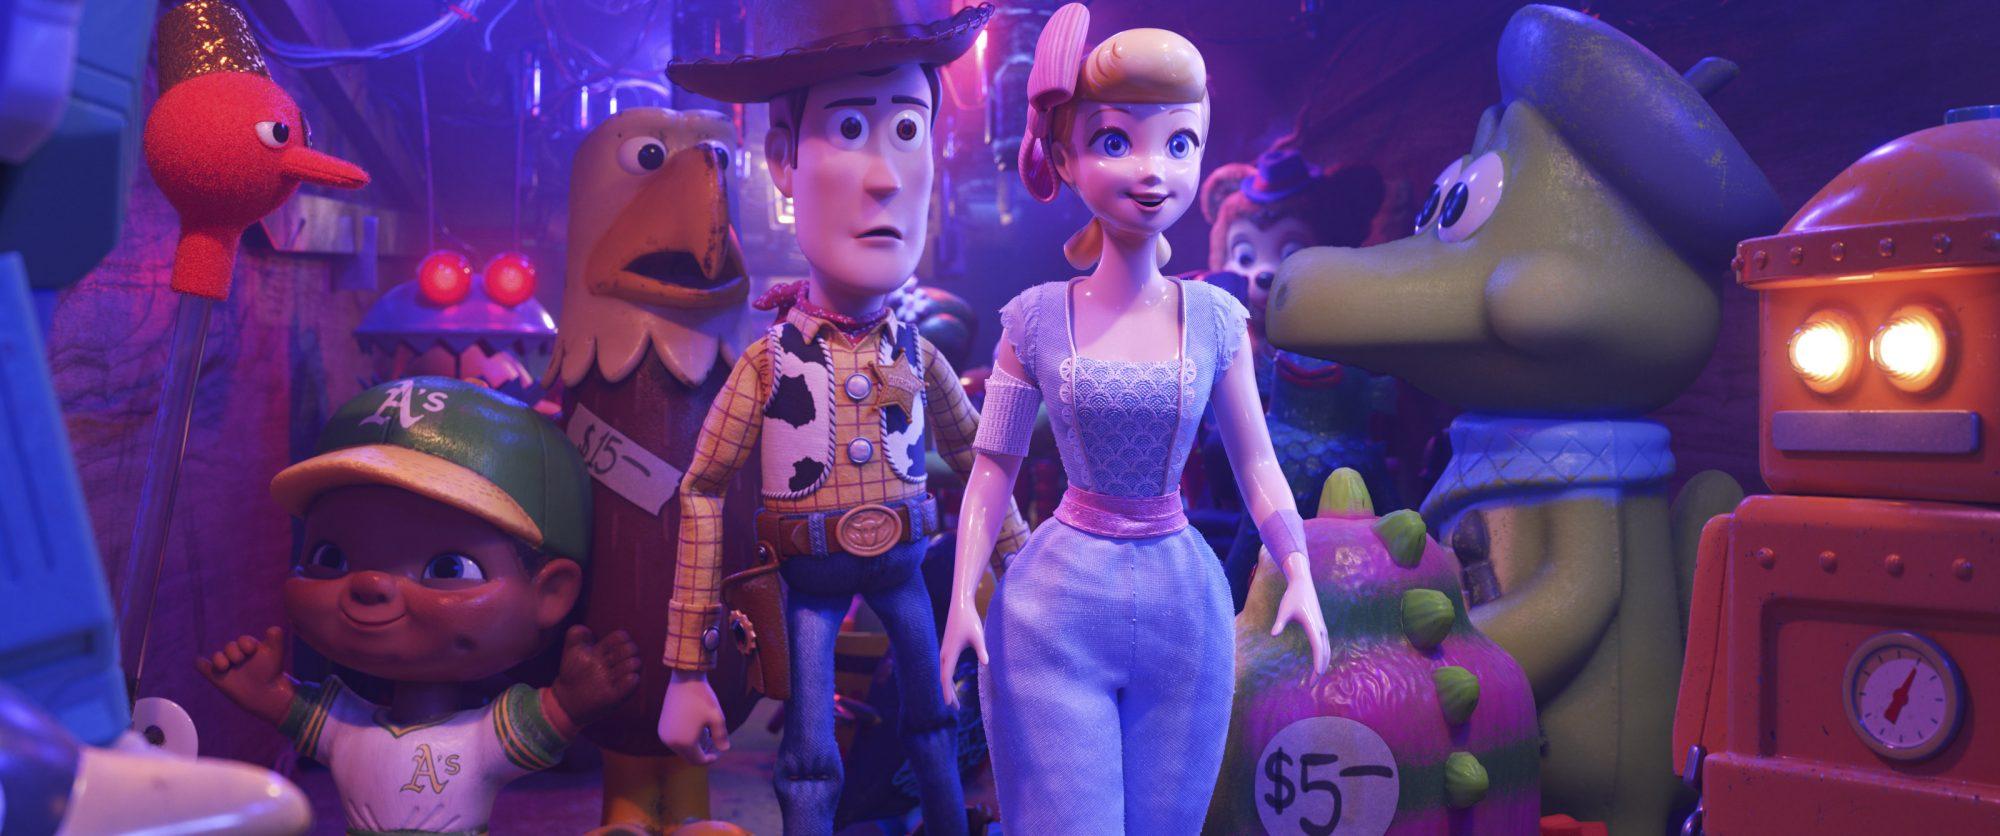 Toy Story 4 CR: Disney/Pixar